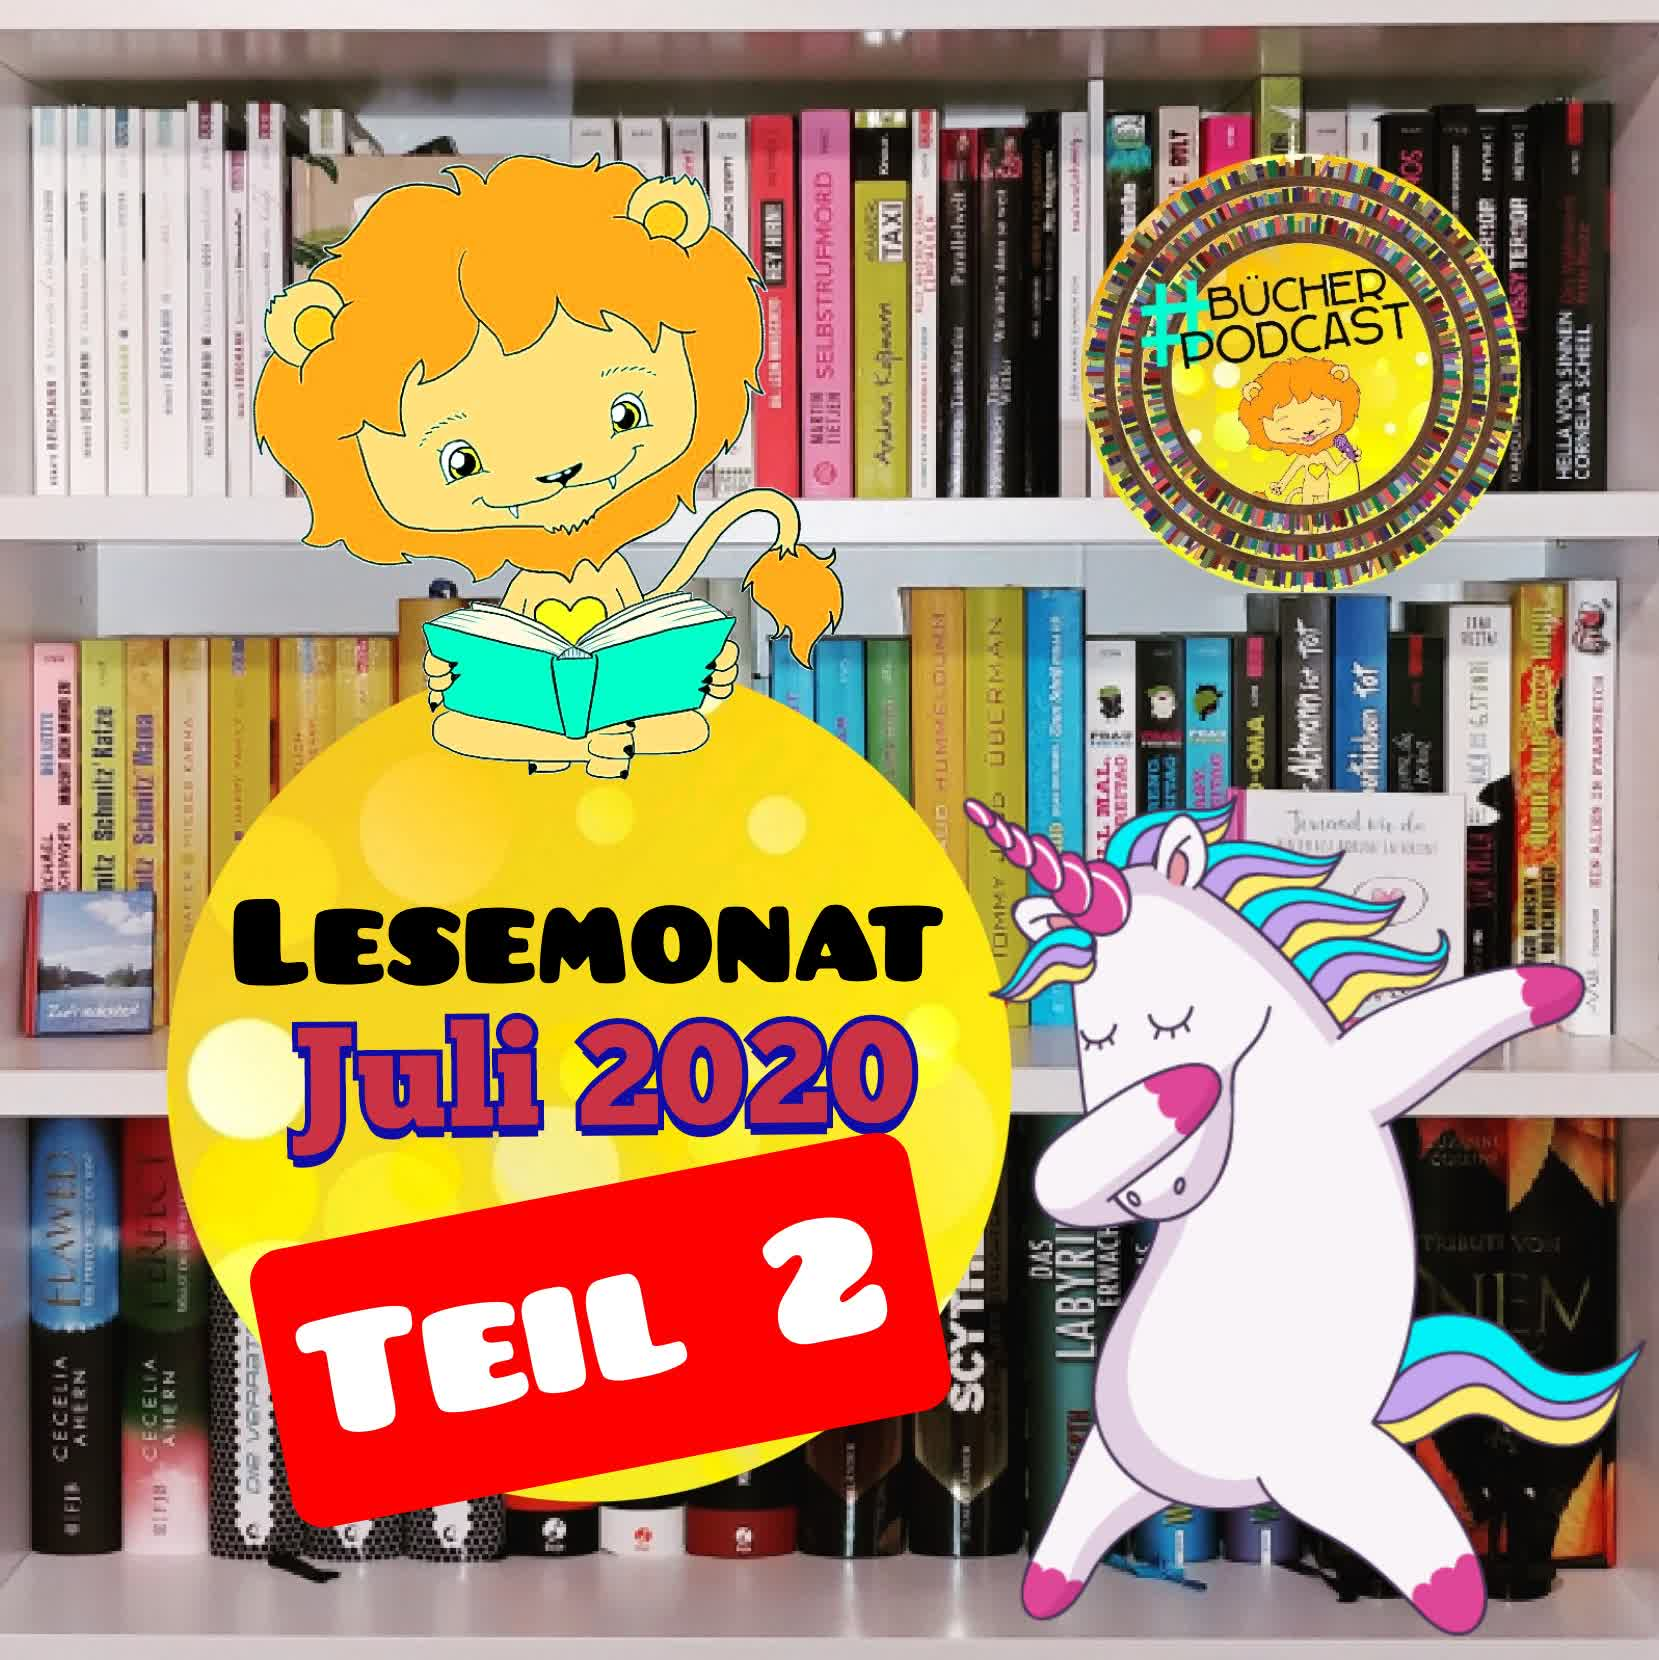 Lesemonat Juli 2020 - Teil 2